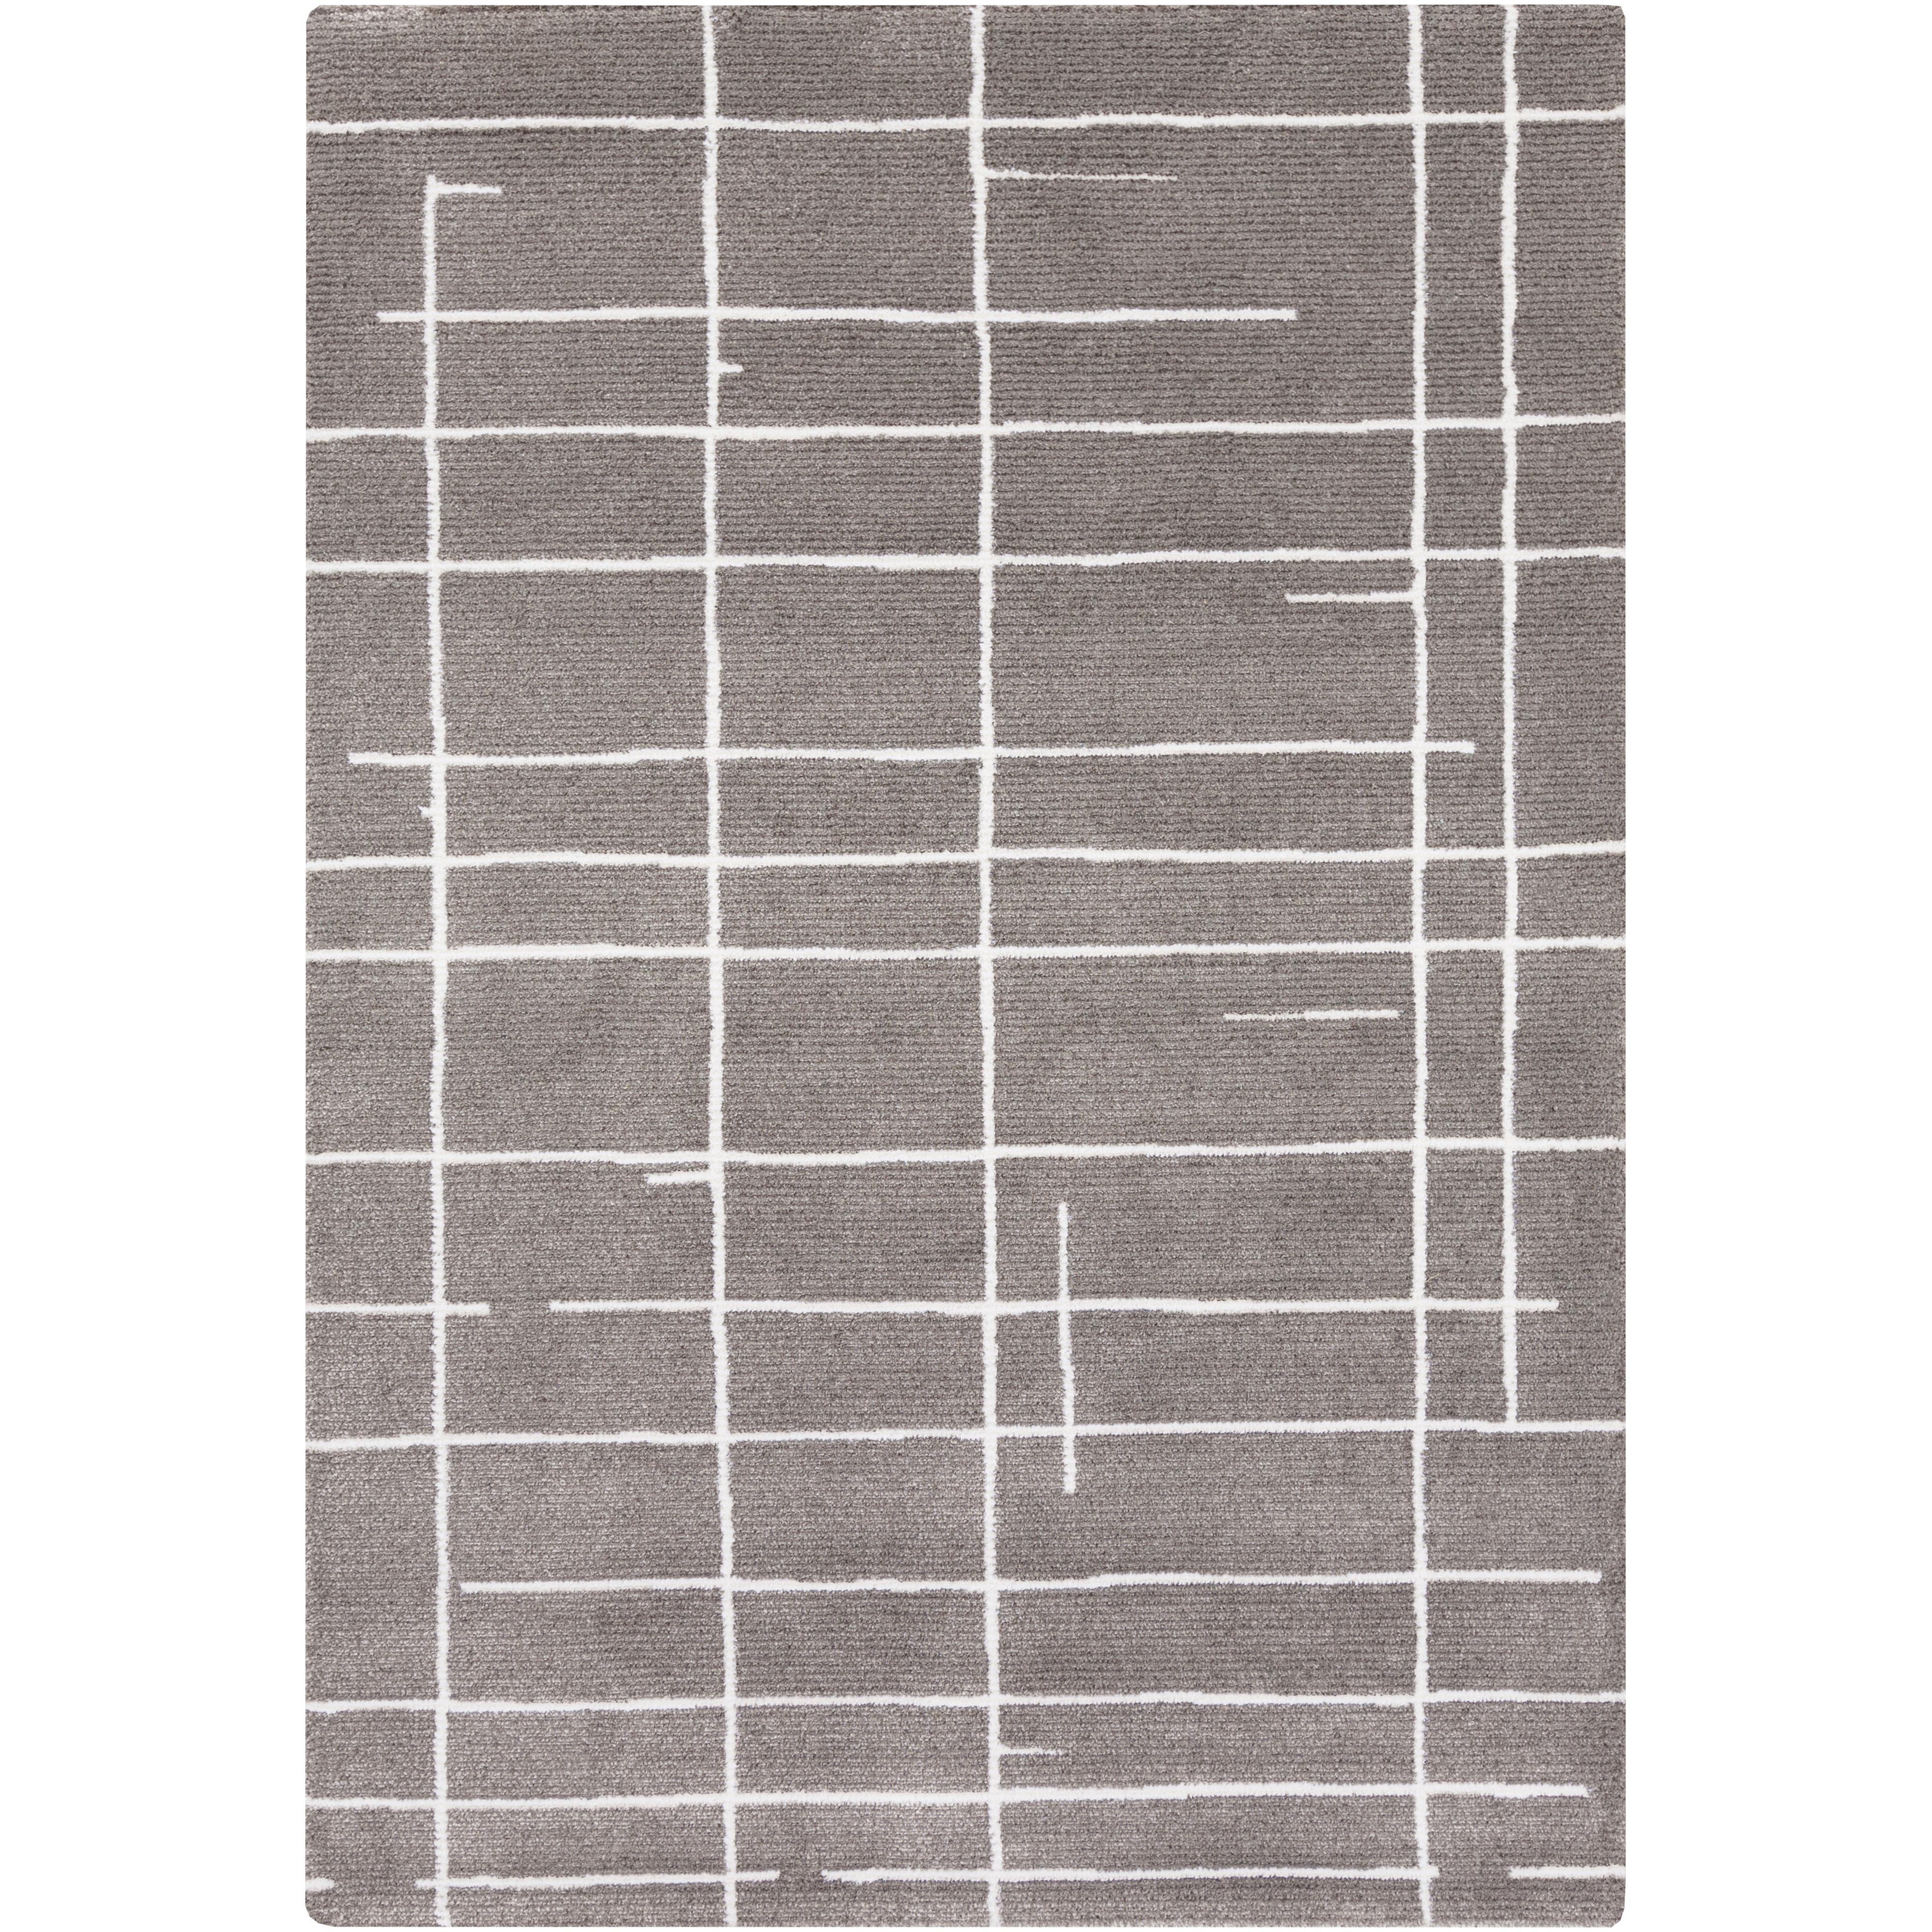 Surya Rugs Perla 9' x 12' - Item Number: PRA6006-912